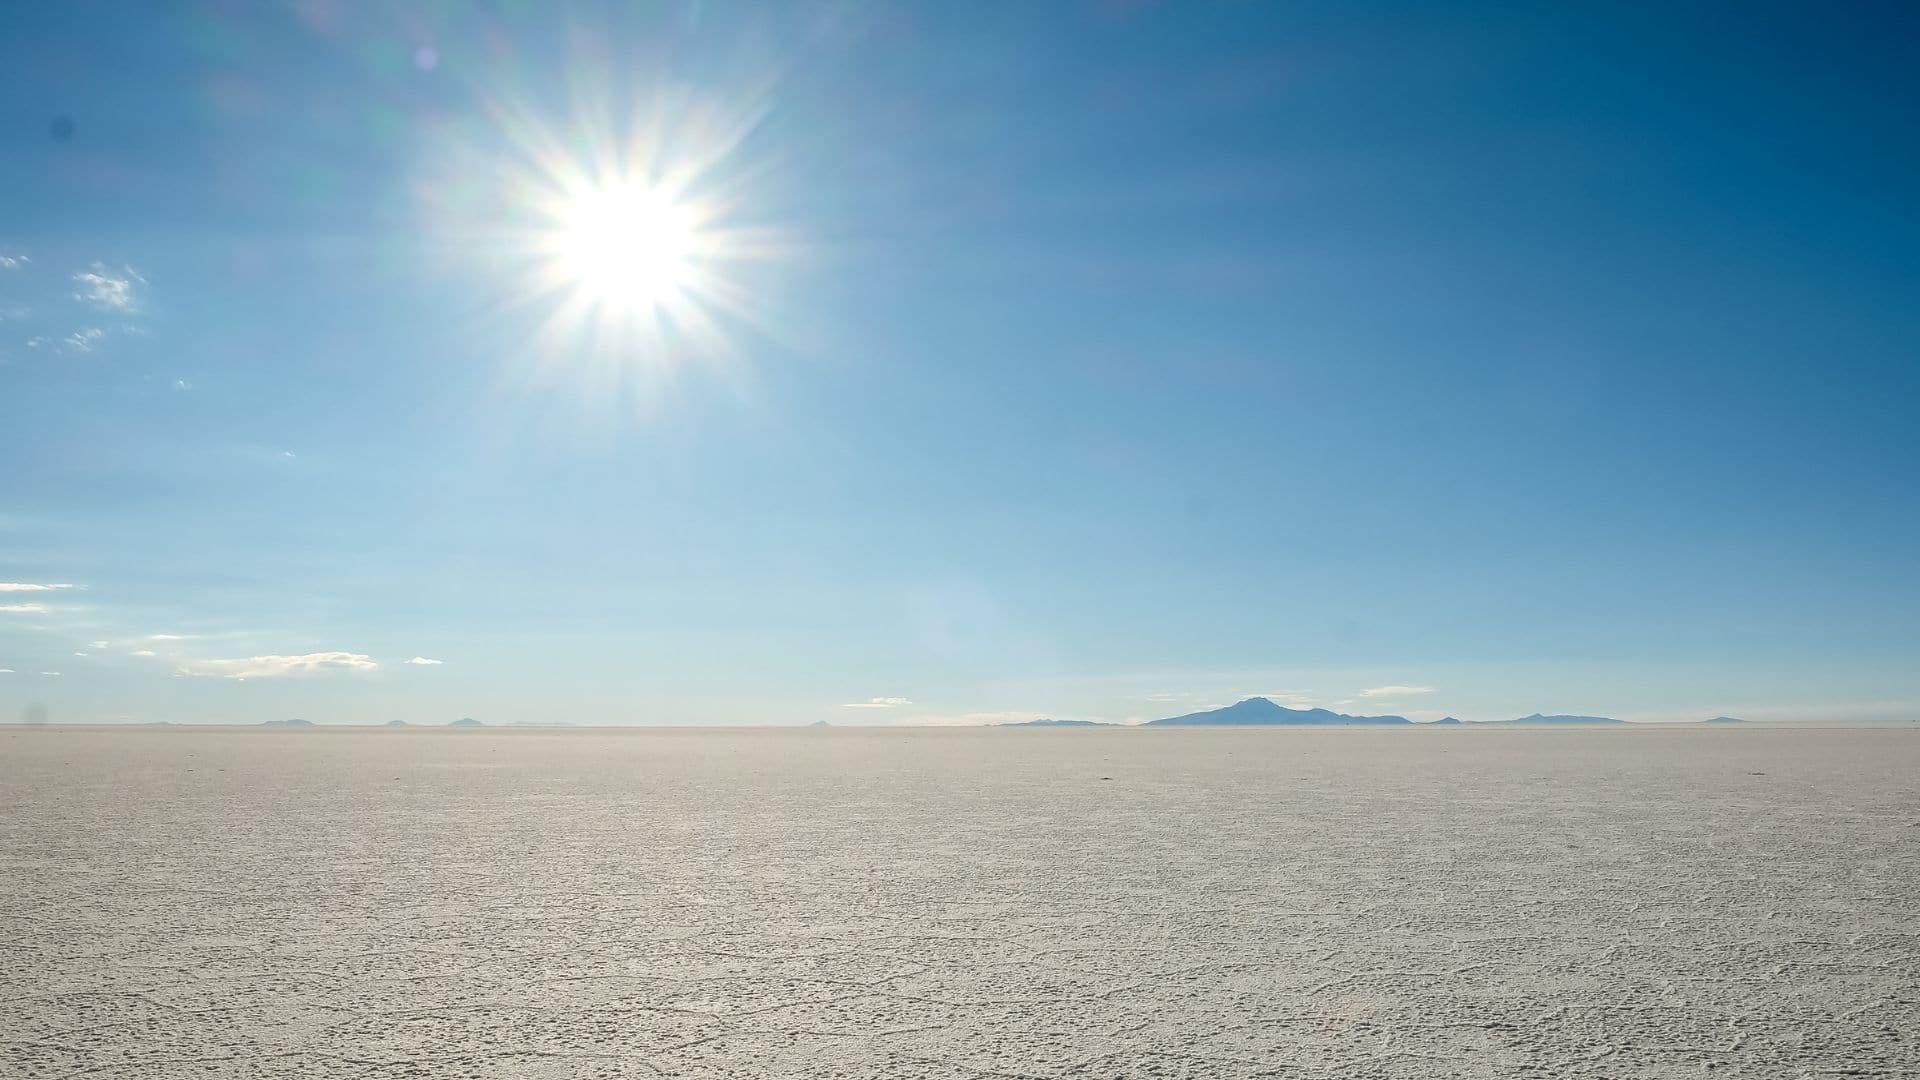 Uyuni vacation spots in South America